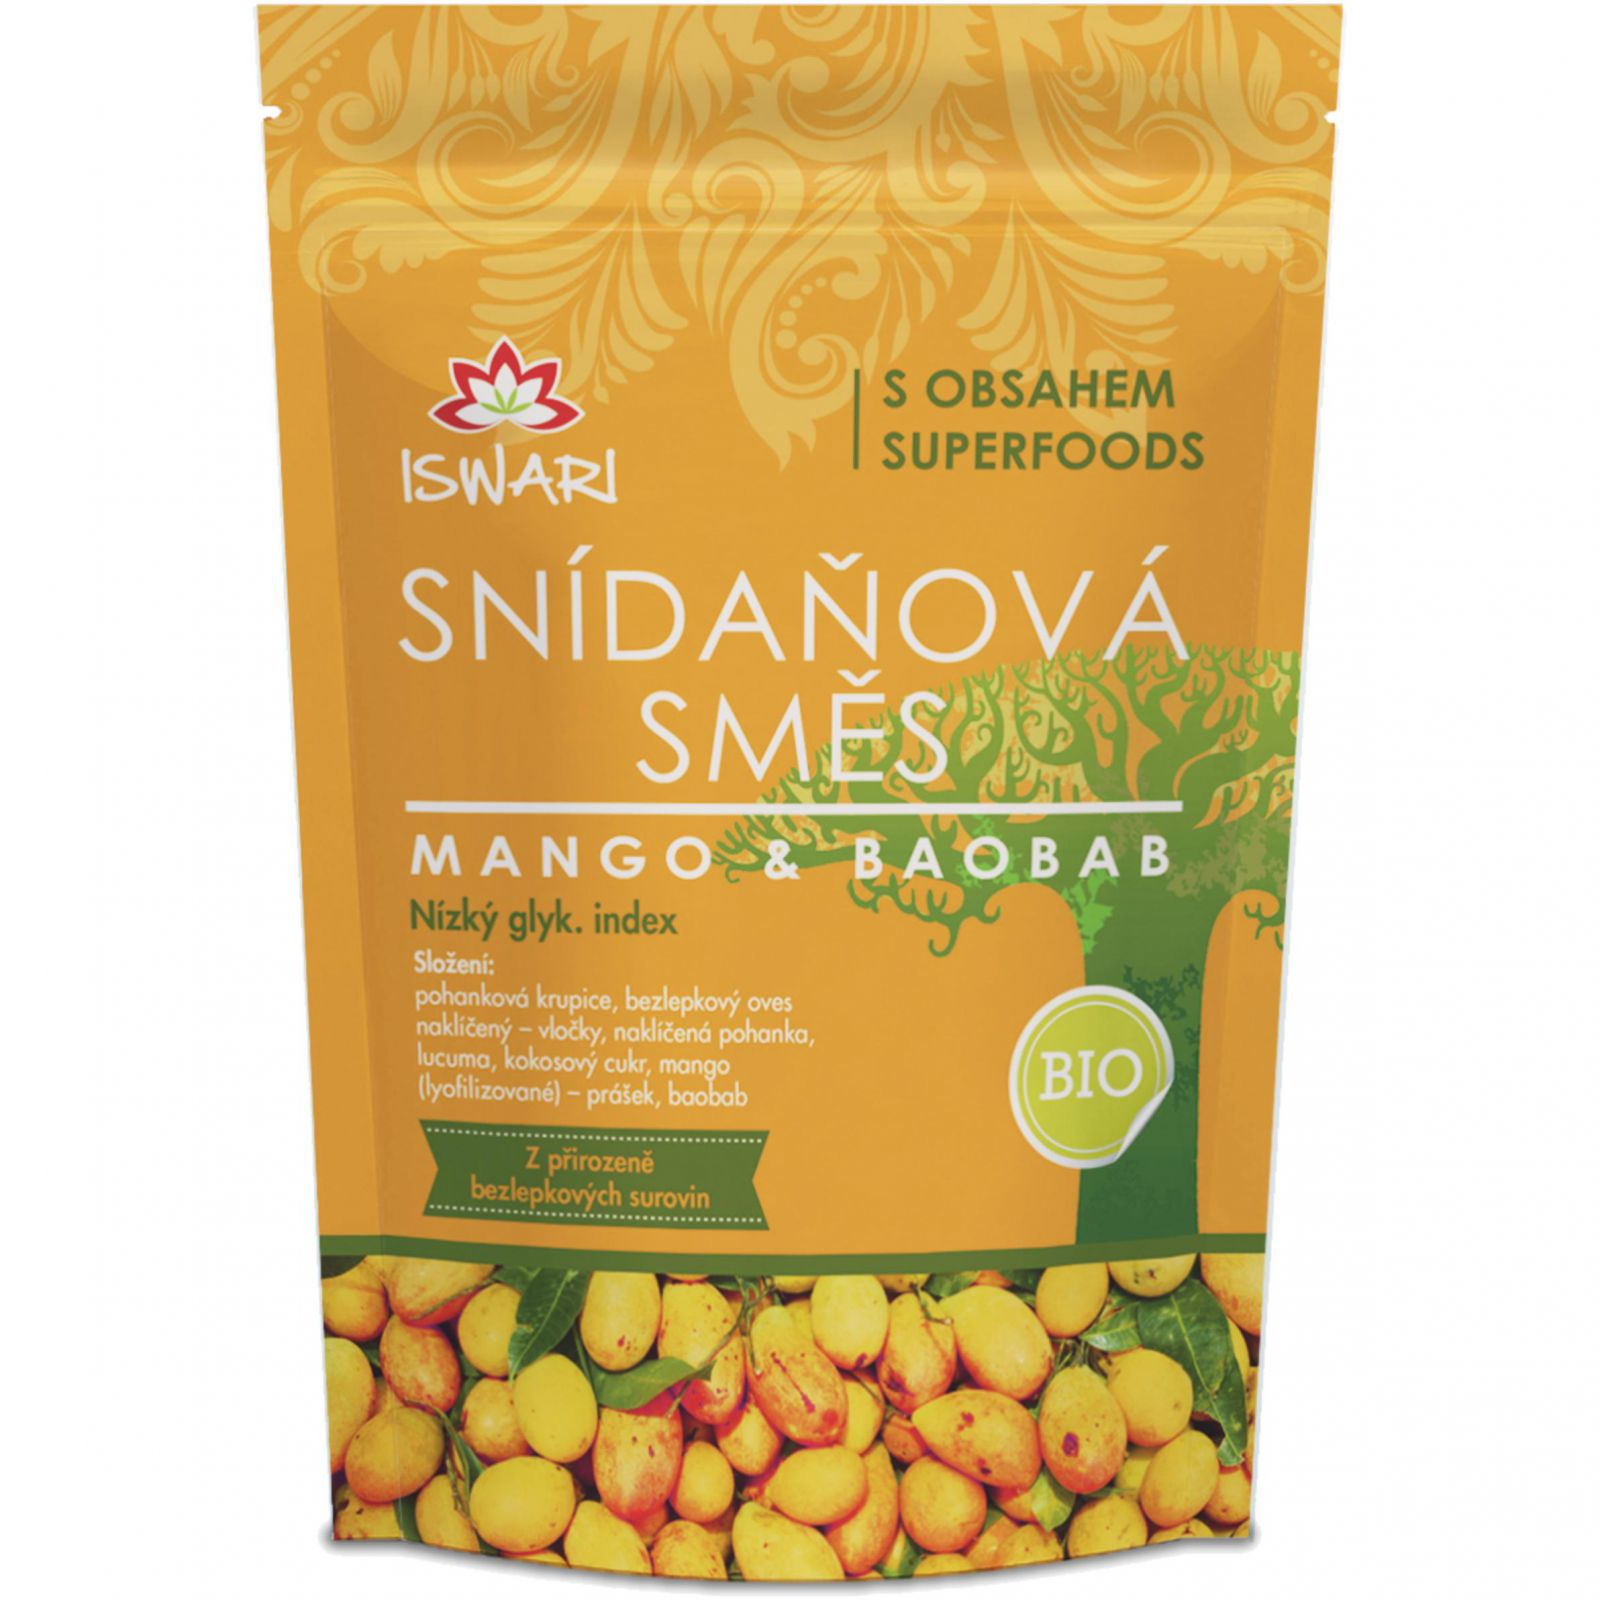 Iswari BIO Snídaňová směs 360 g - mango & baobab